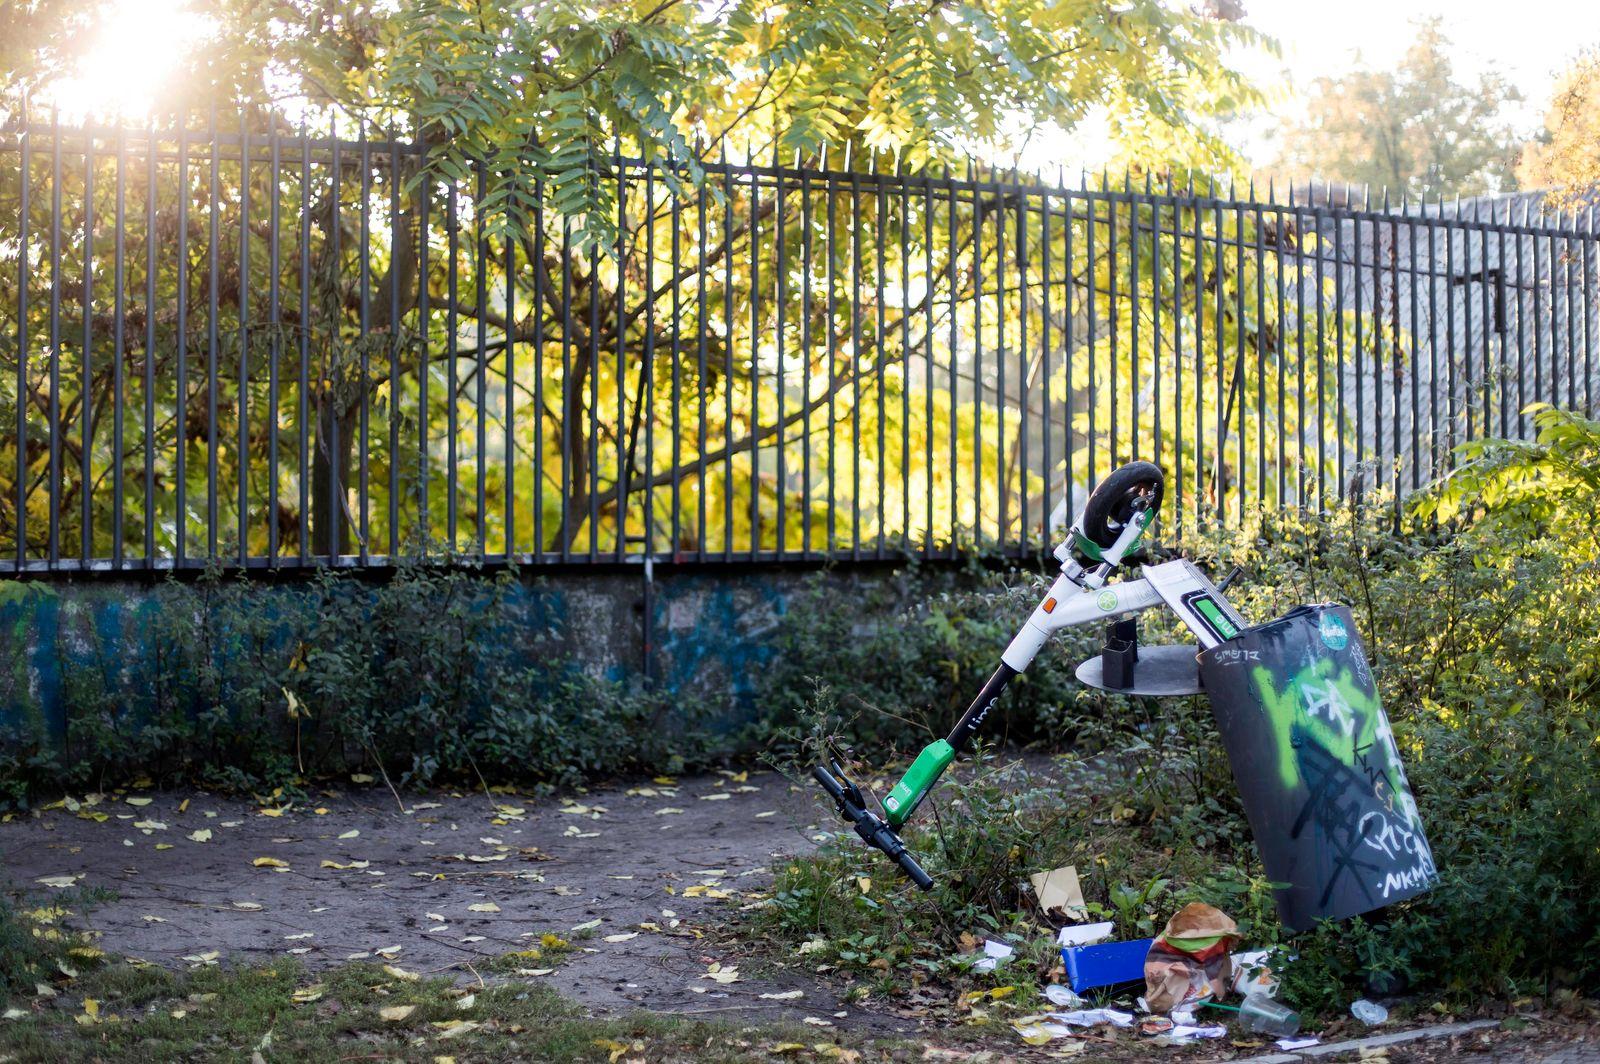 Entsorgter E-Scooter des Anbieters Lime in einem M¸lleimer am Zoologischen Garten. Berlin, 28.10.2019 *** Disposed E Sco